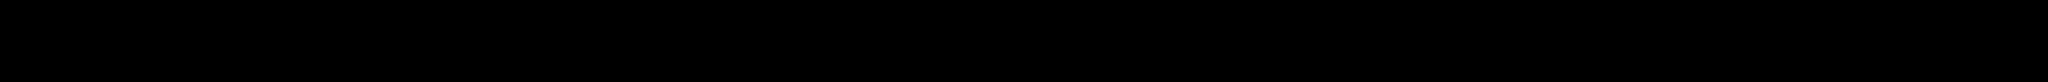 BERU 0040100052, 224333529R, 224333529R, 224333529R, 22448-00Q0A Cewka zapłonowa